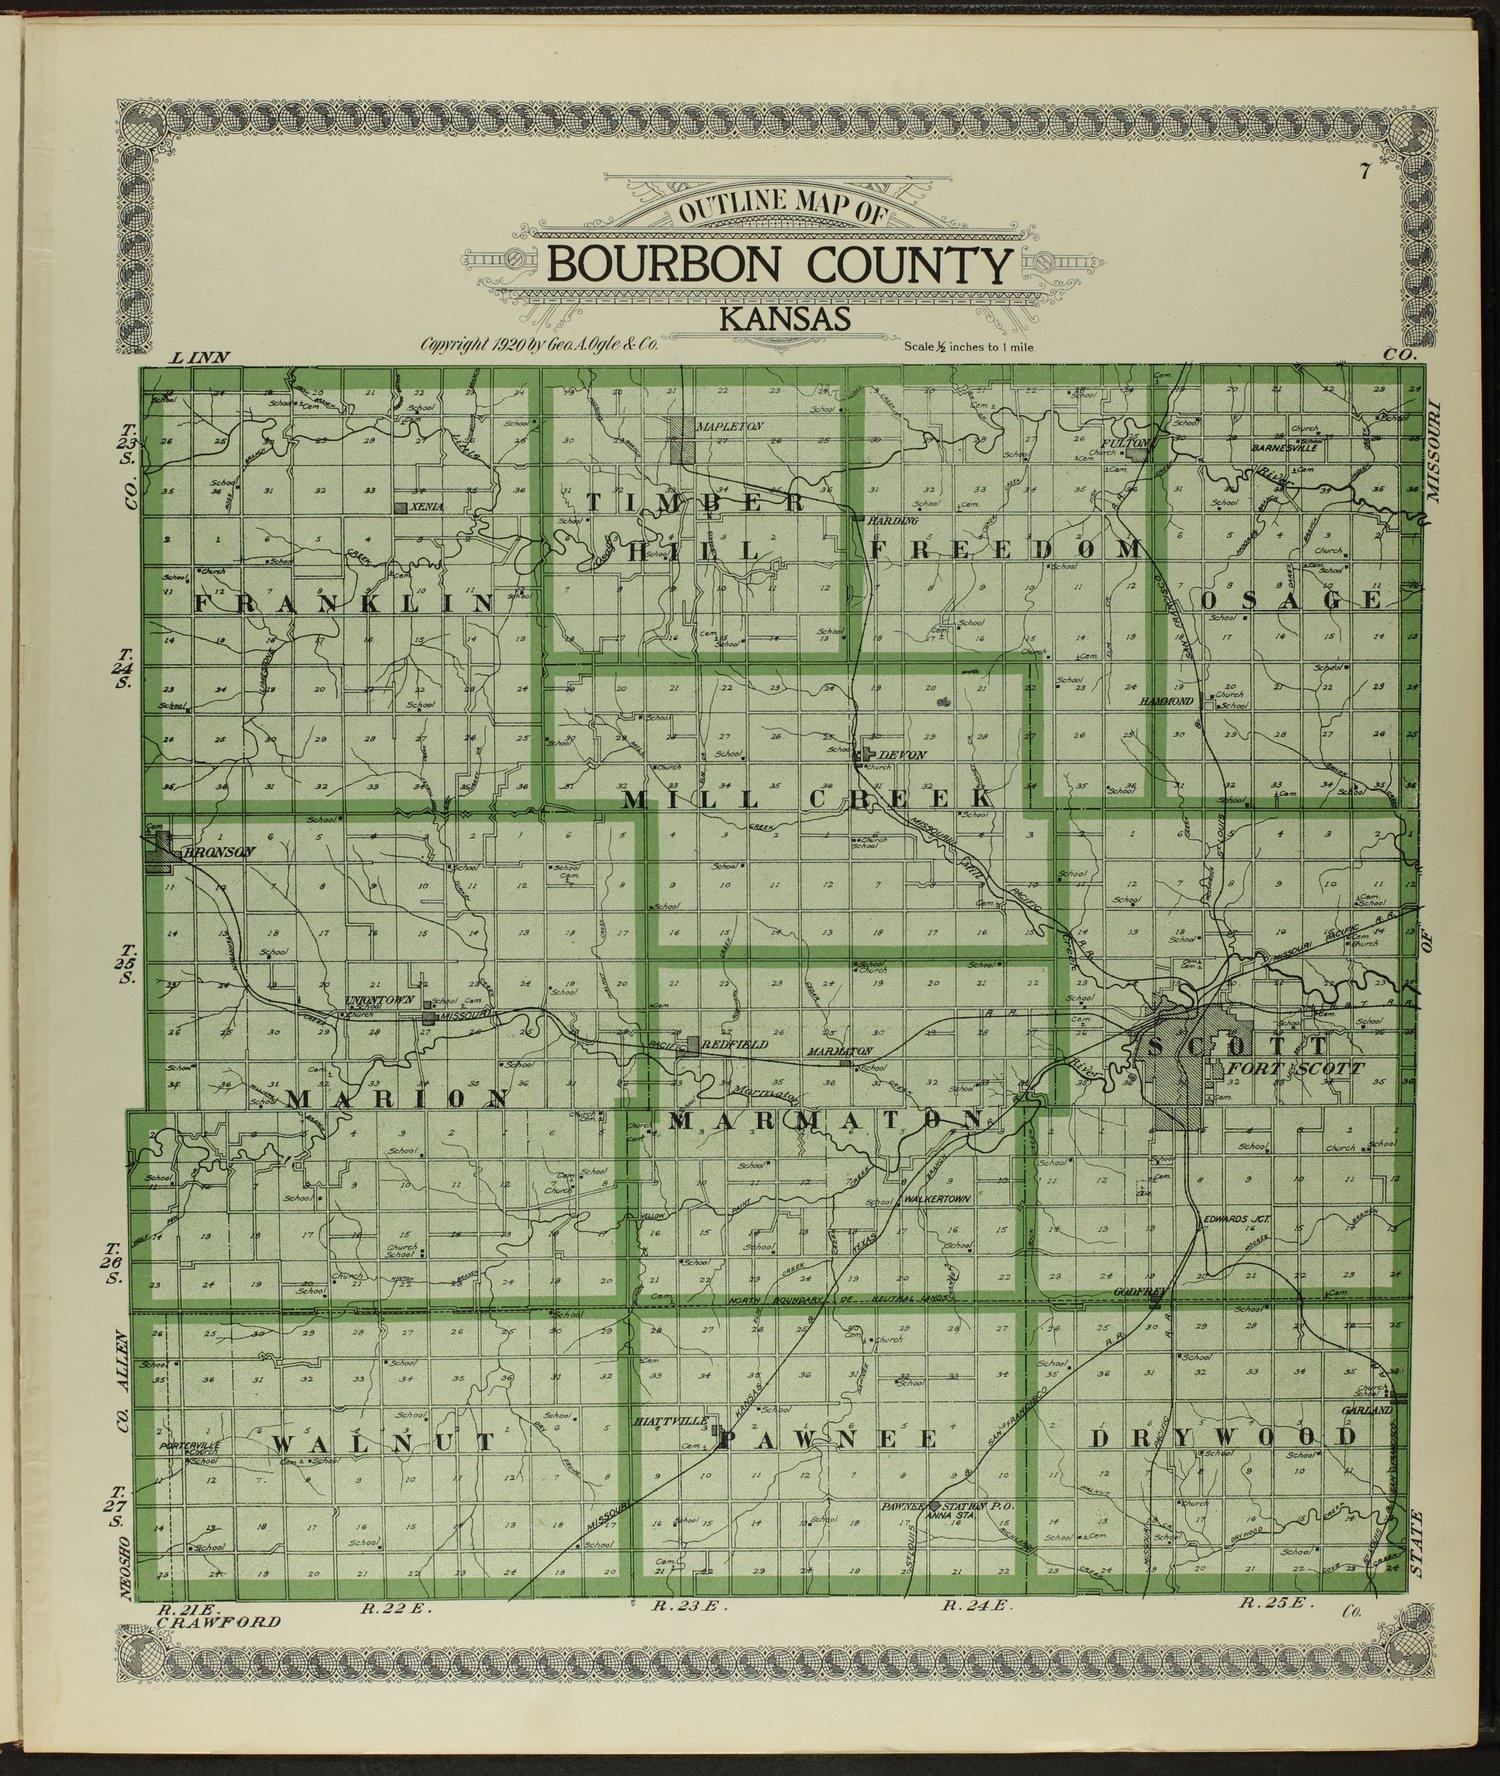 Standard atlas of Bourbon County, Kansas - 7